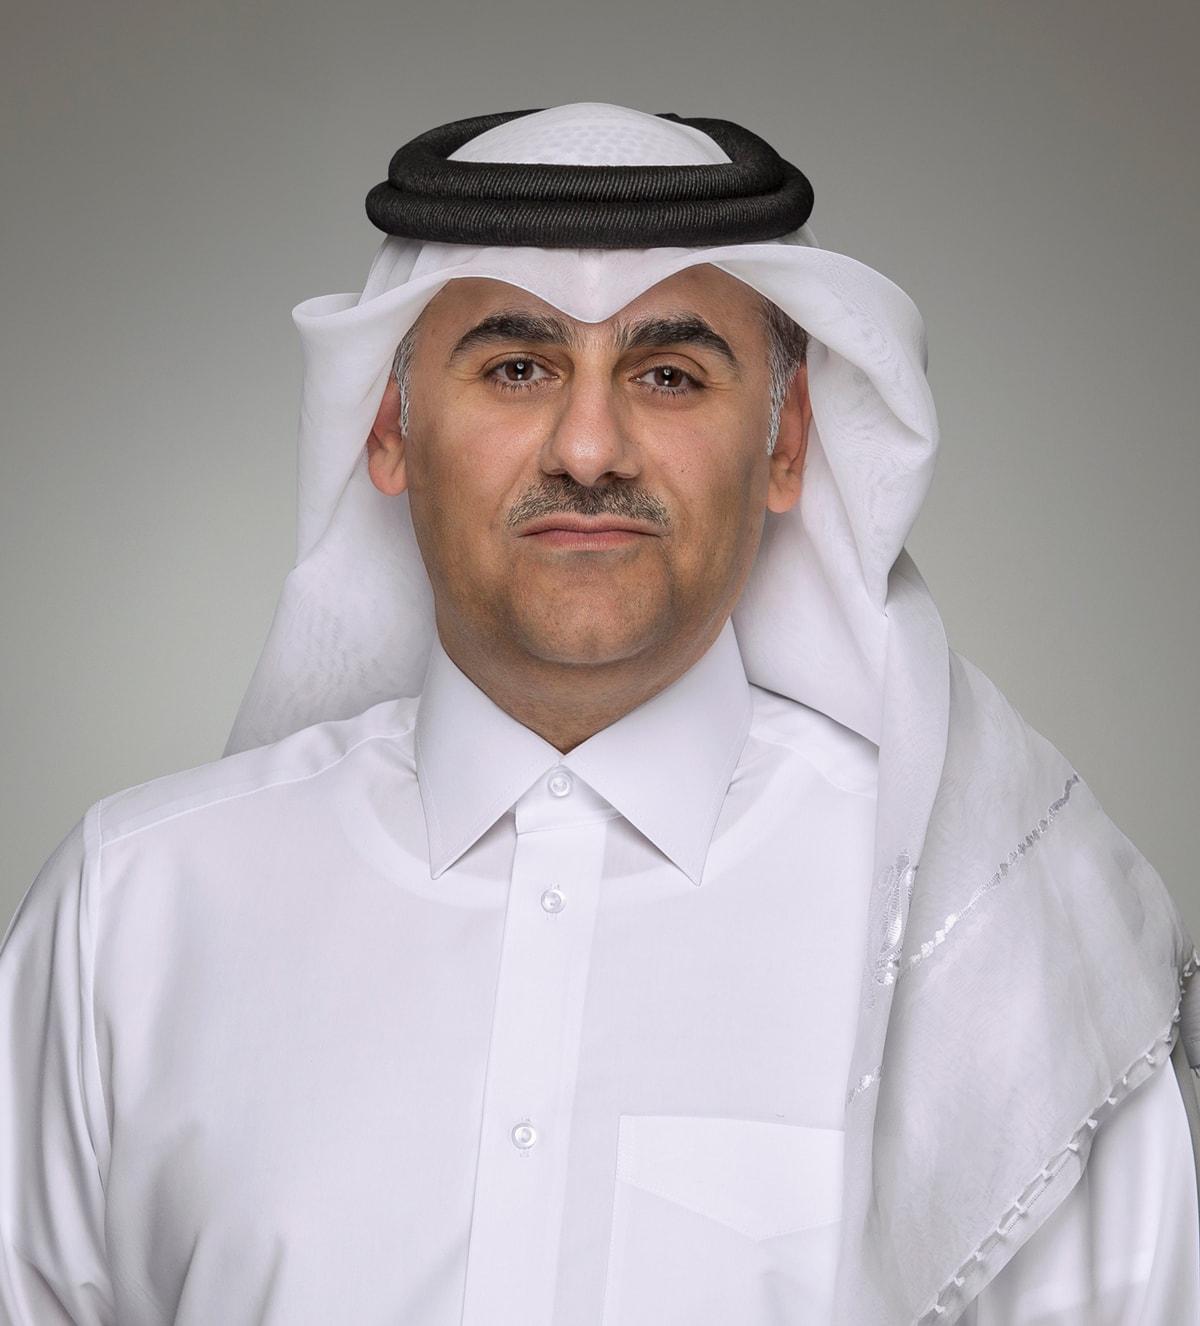 Mohammed Al-Ansari